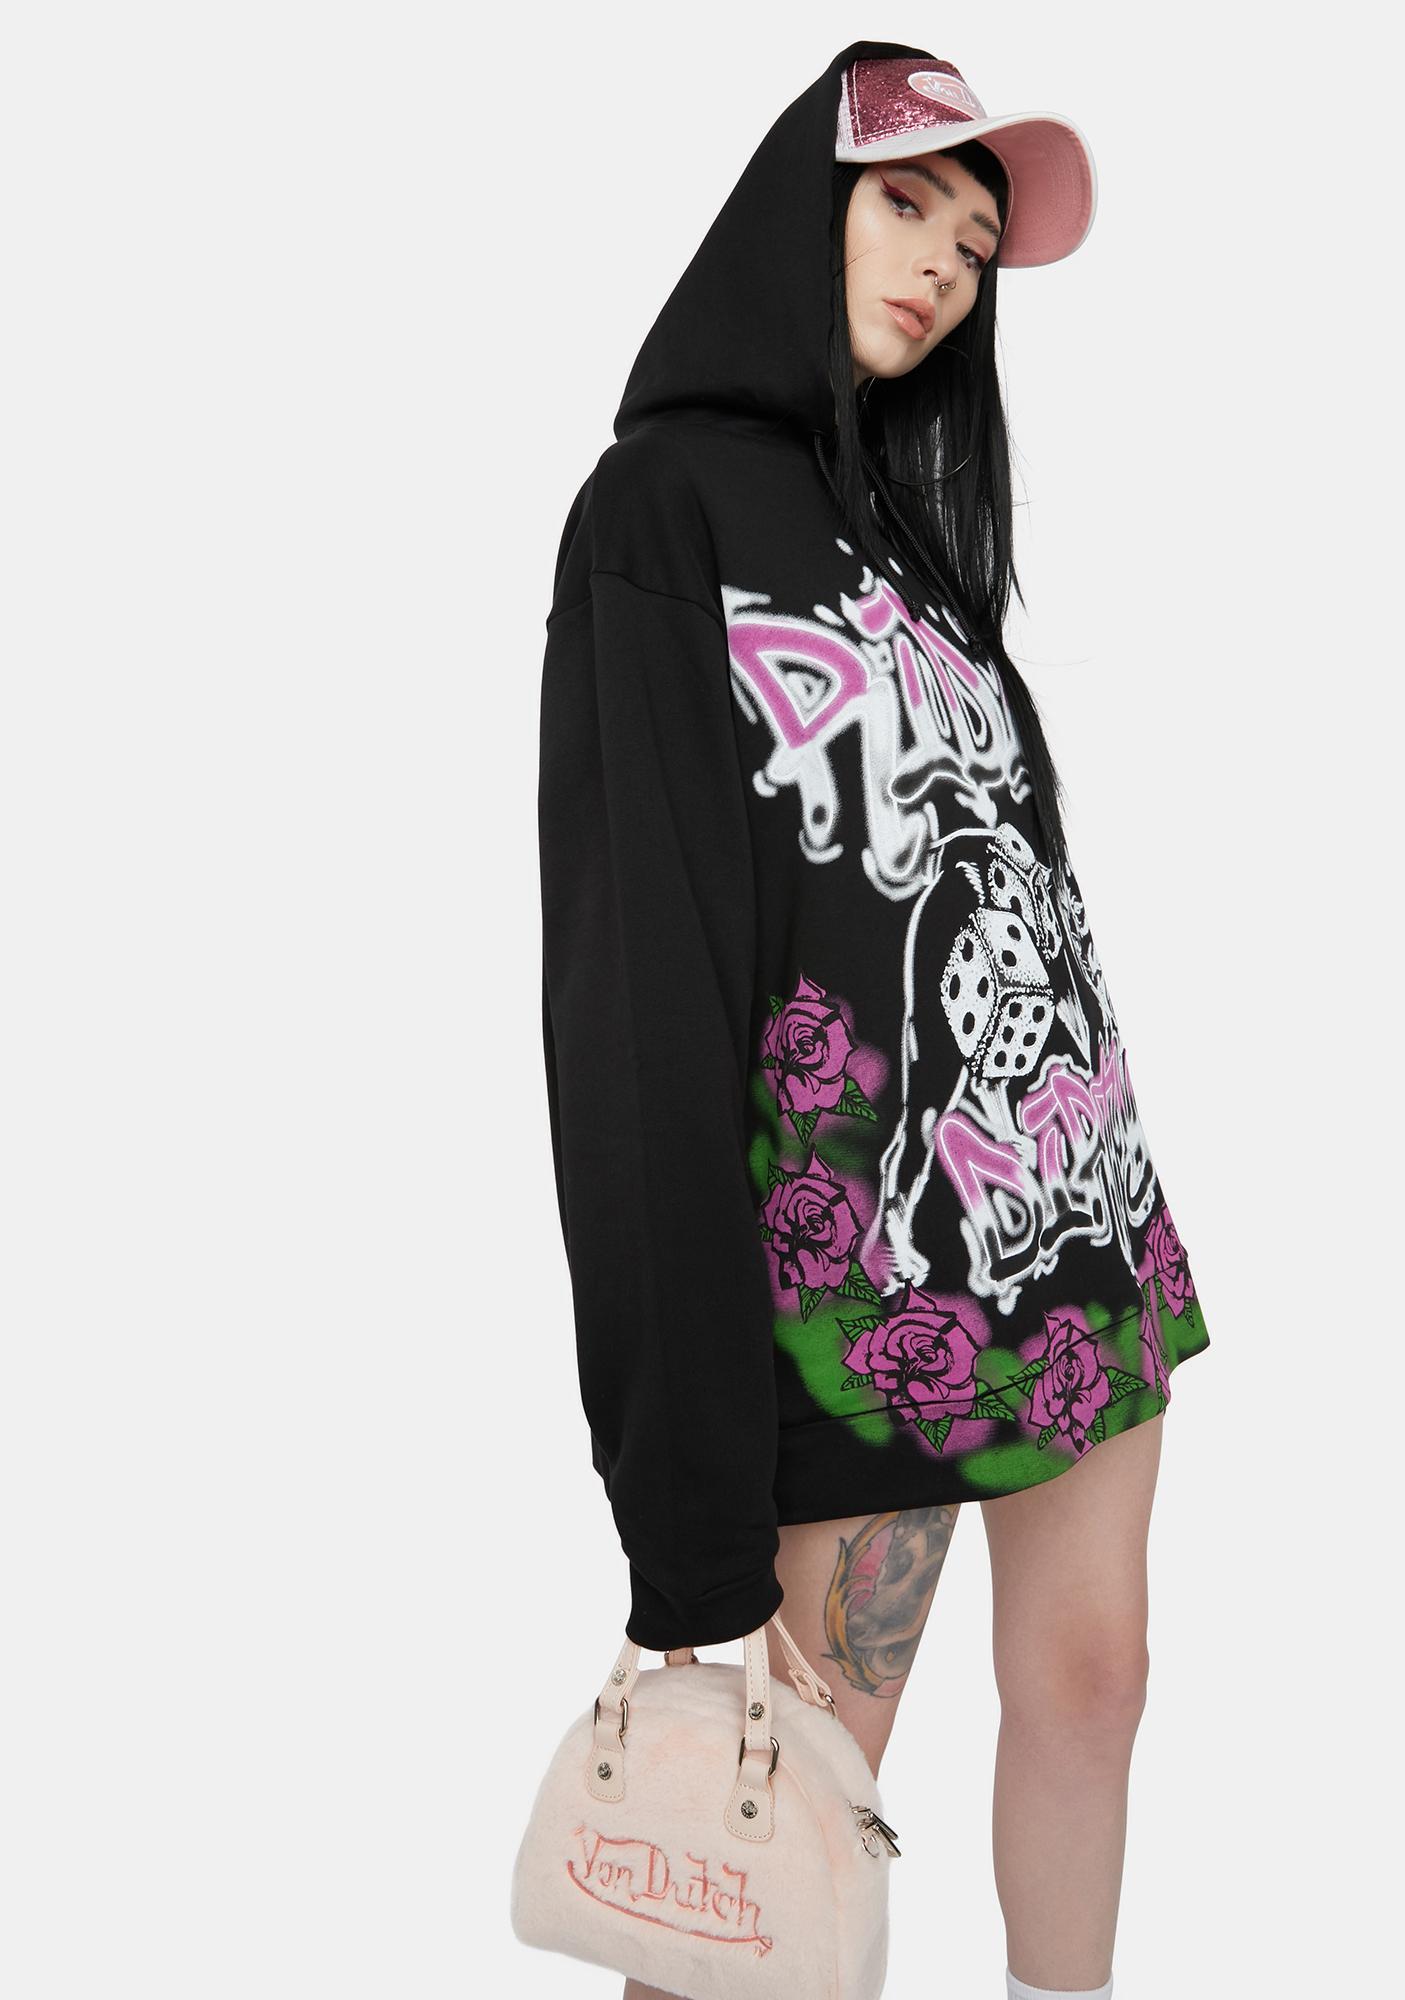 Jaded London Ridin' Dirty Graffiti Print Oversized Hoodie